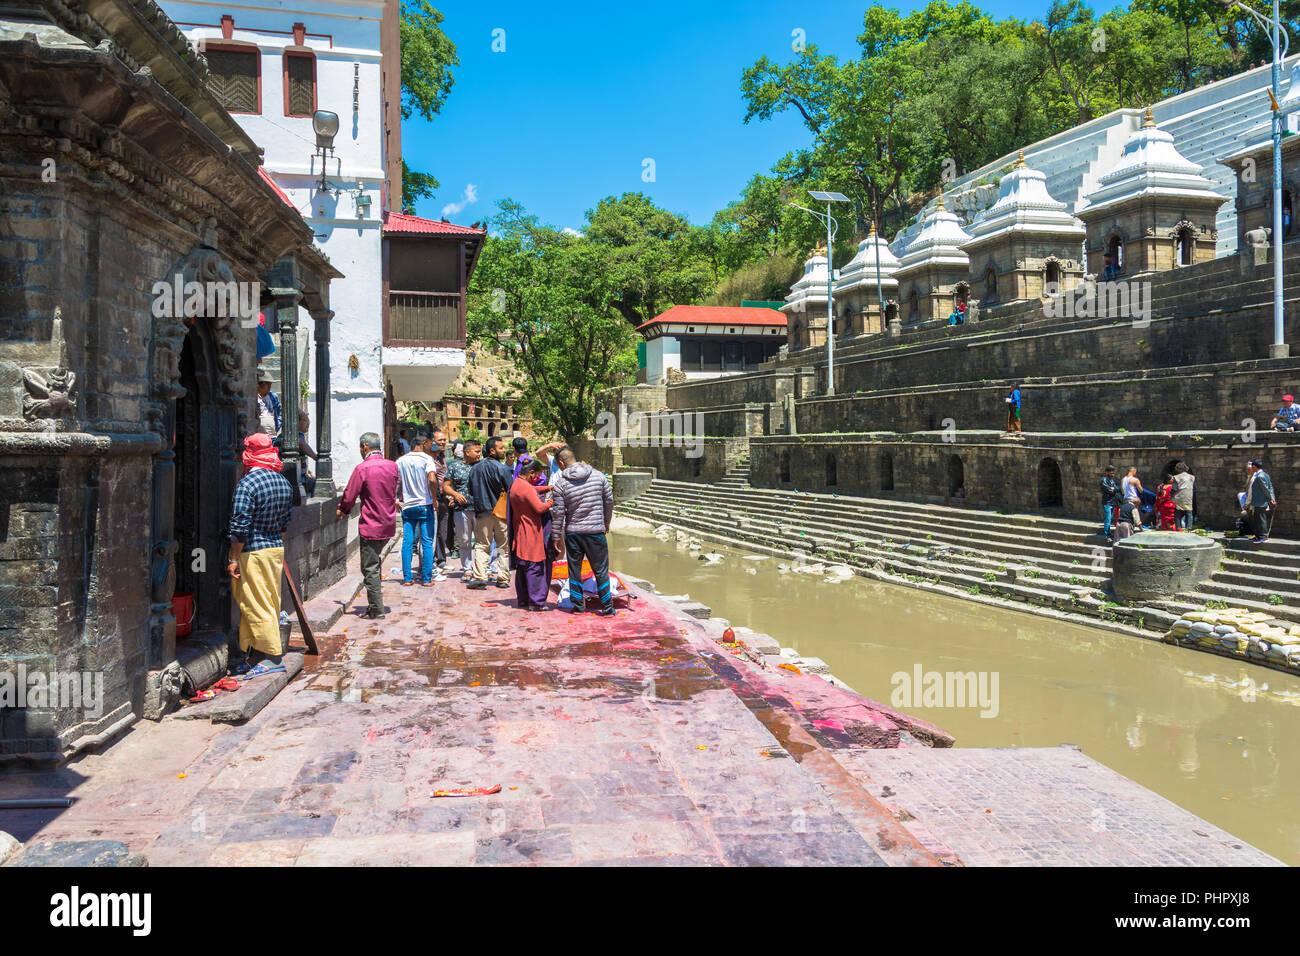 Kathmandu, Nepal – 13.04.2018: Burial ceremony on the banks of the Bagmati river in the Pashupatinath Temple 13 April 2018, Kathmandu, Nepal. - Stock Image